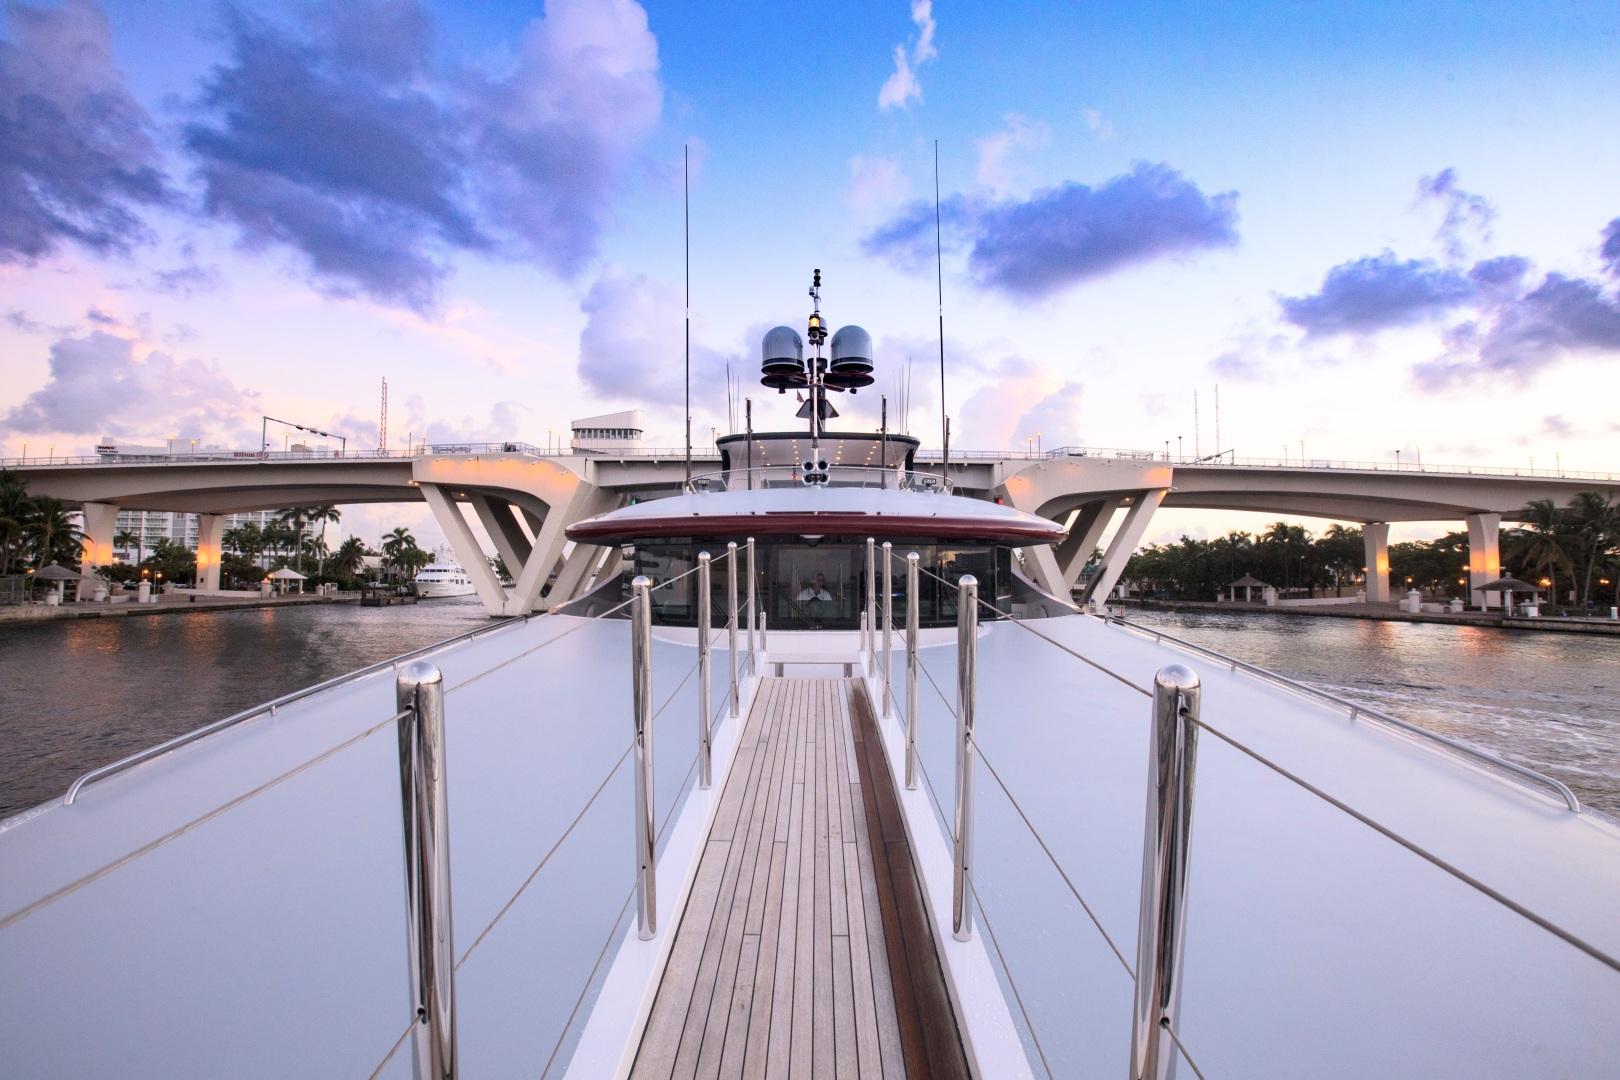 Trinity Yachts-164 Tri-deck Motor Yacht 2008-Amarula Sun Fort Lauderdale-Florida-United States-Bow-1513904 | Thumbnail